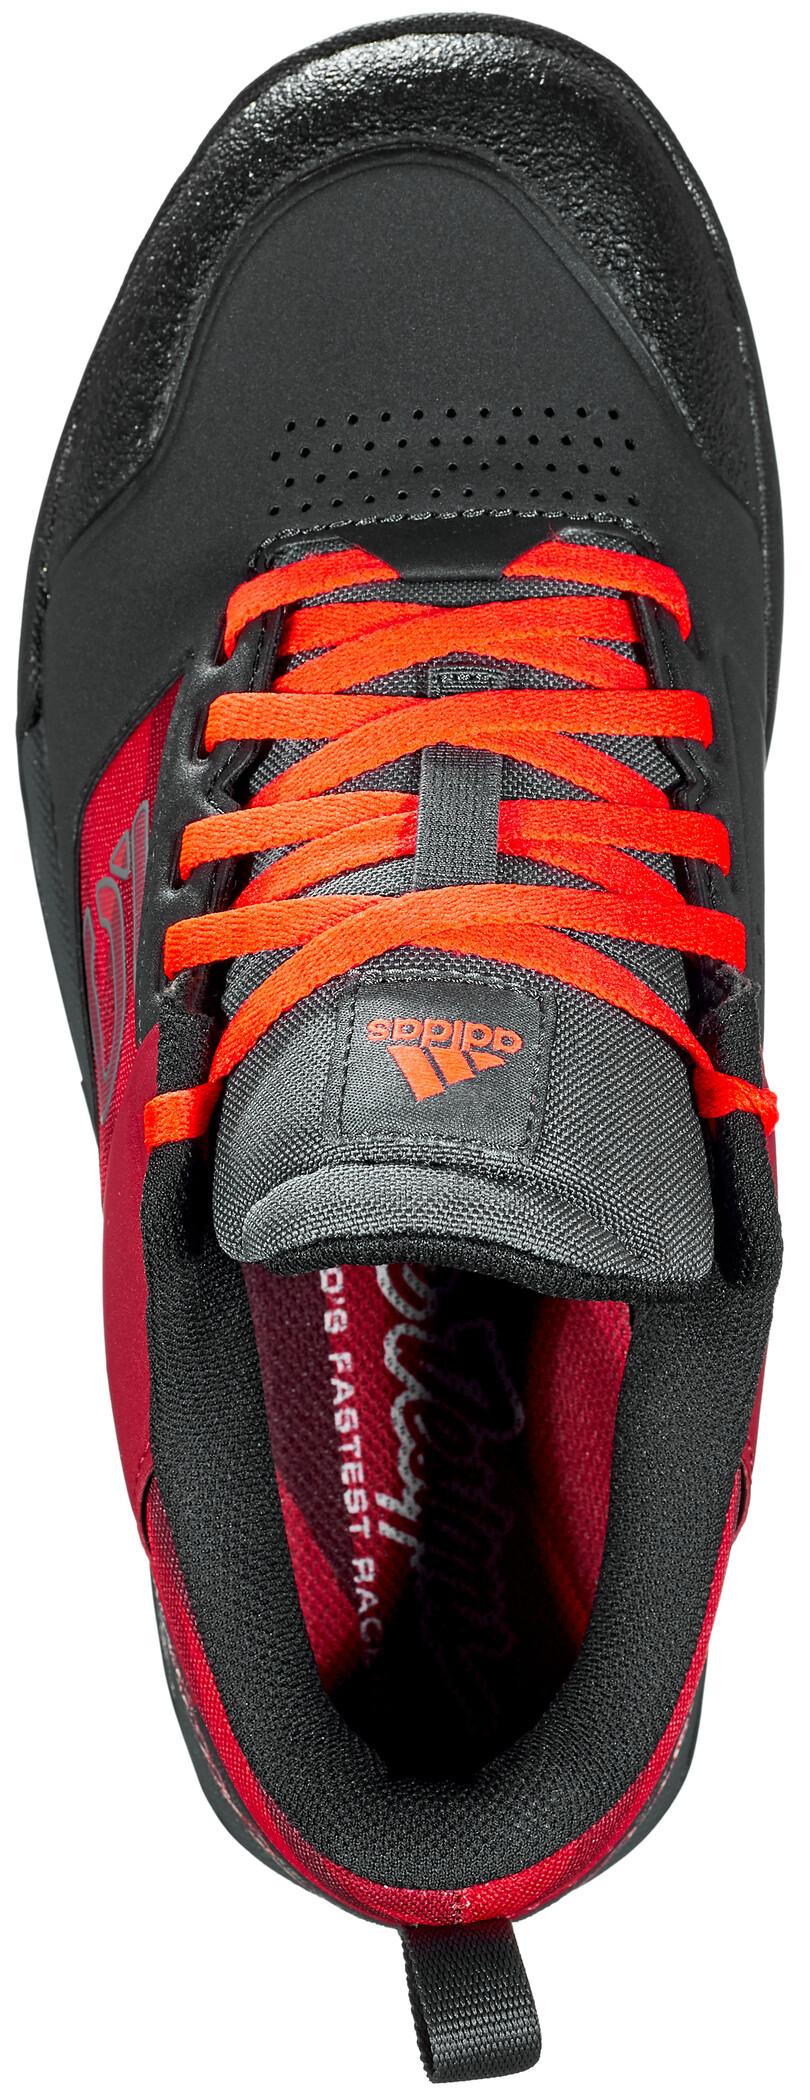 adidas Five Ten Impact Pro TLD Mountain Bike Schuhe Herren carbonstrong redsolar red